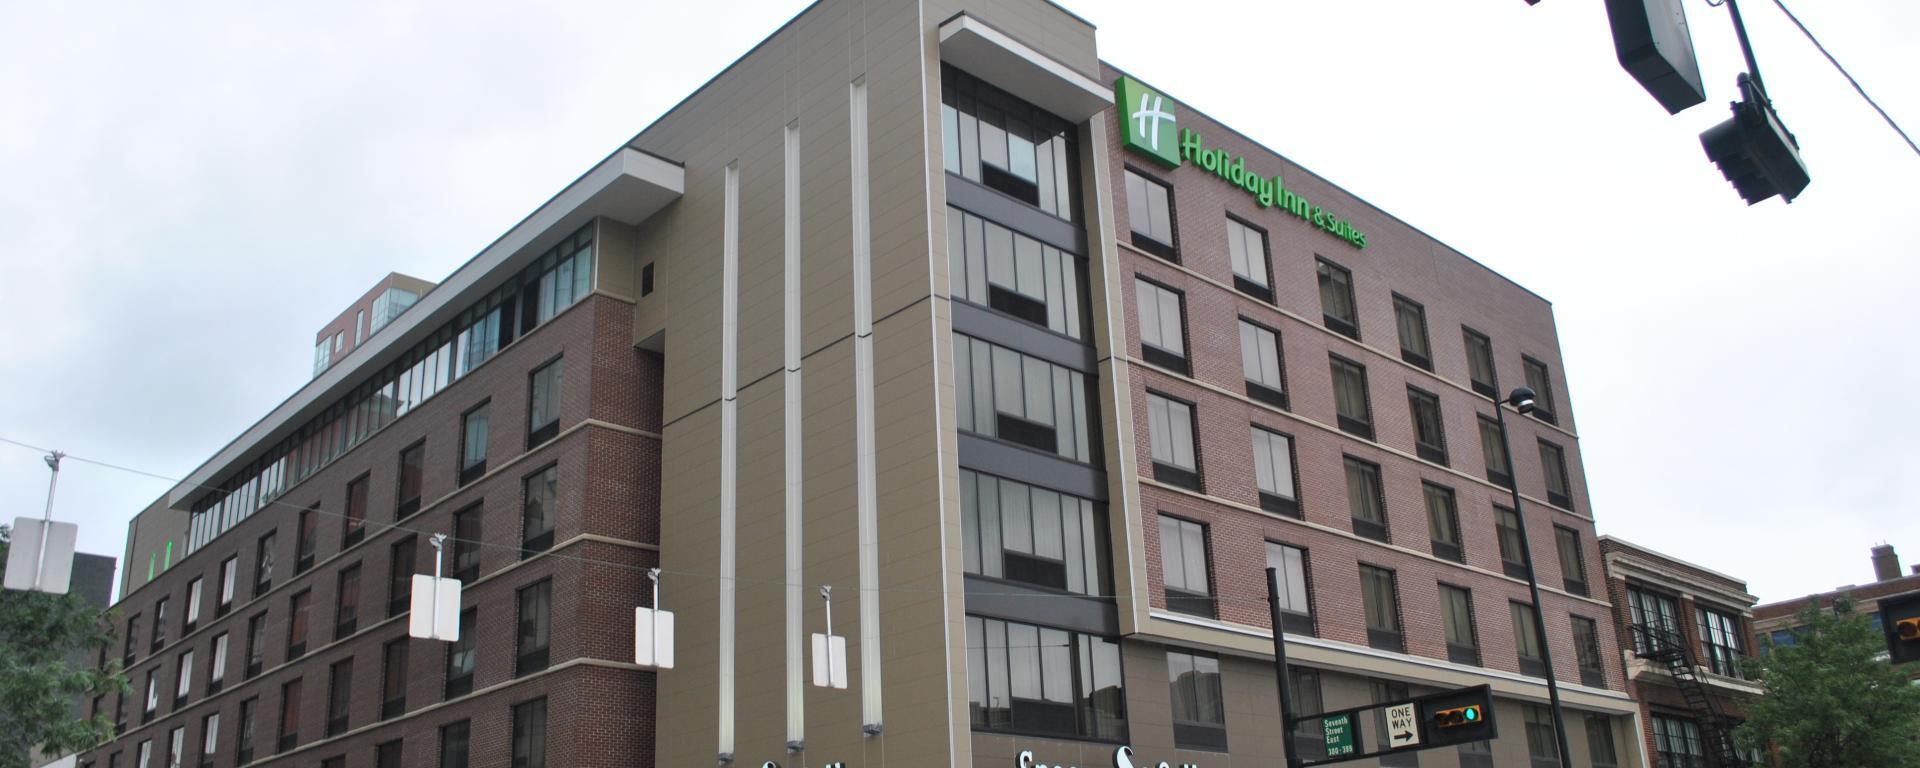 Holiday Inn 7th & Broadway